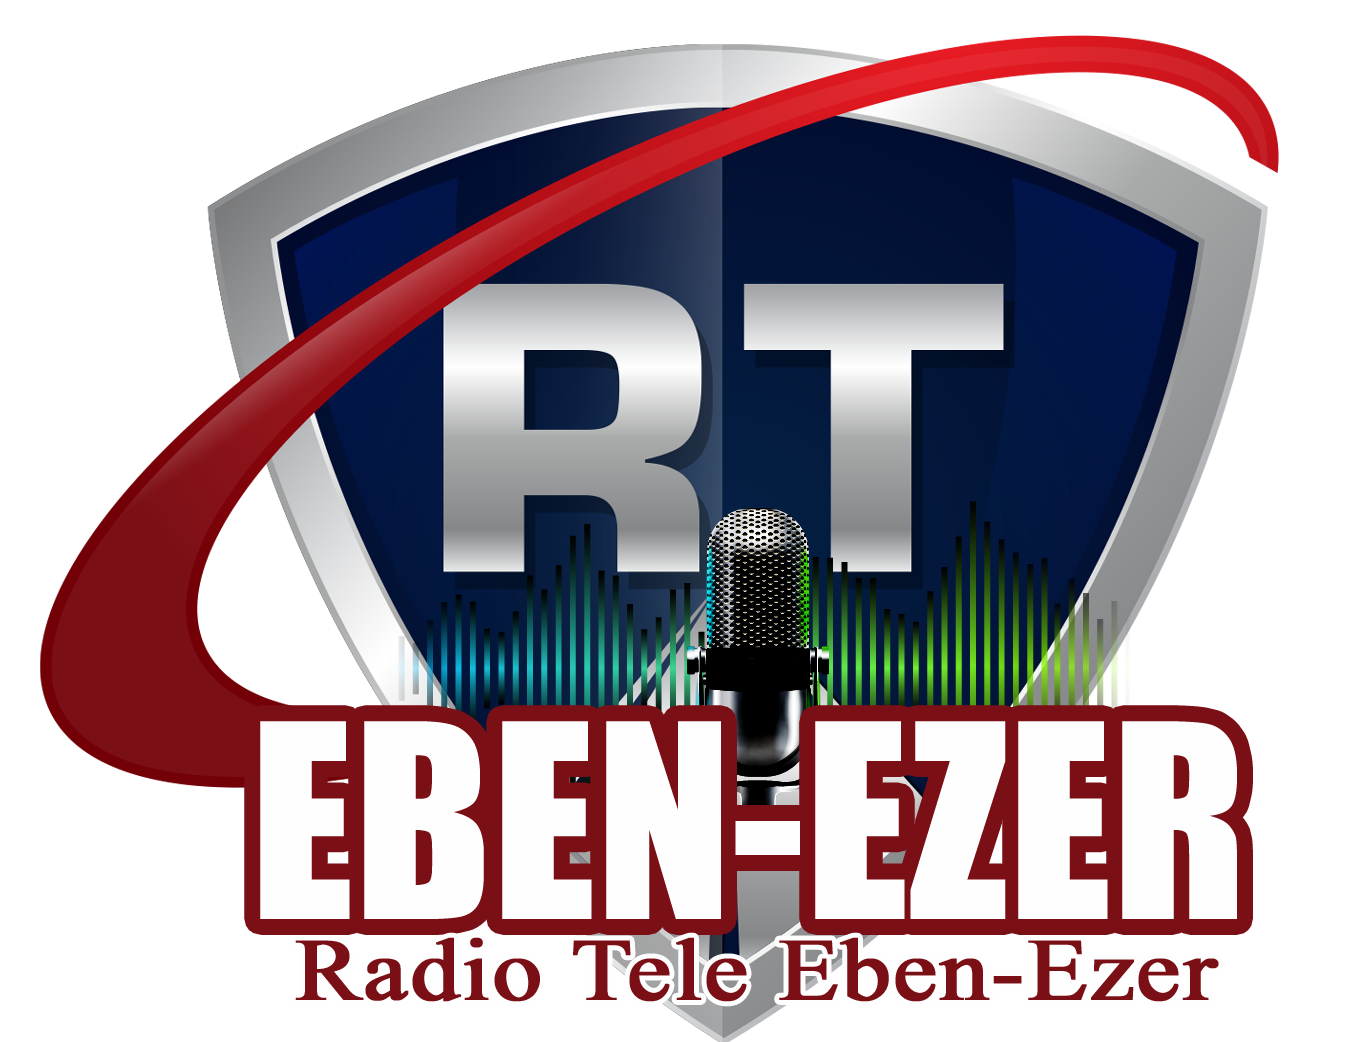 new ebenezer logo